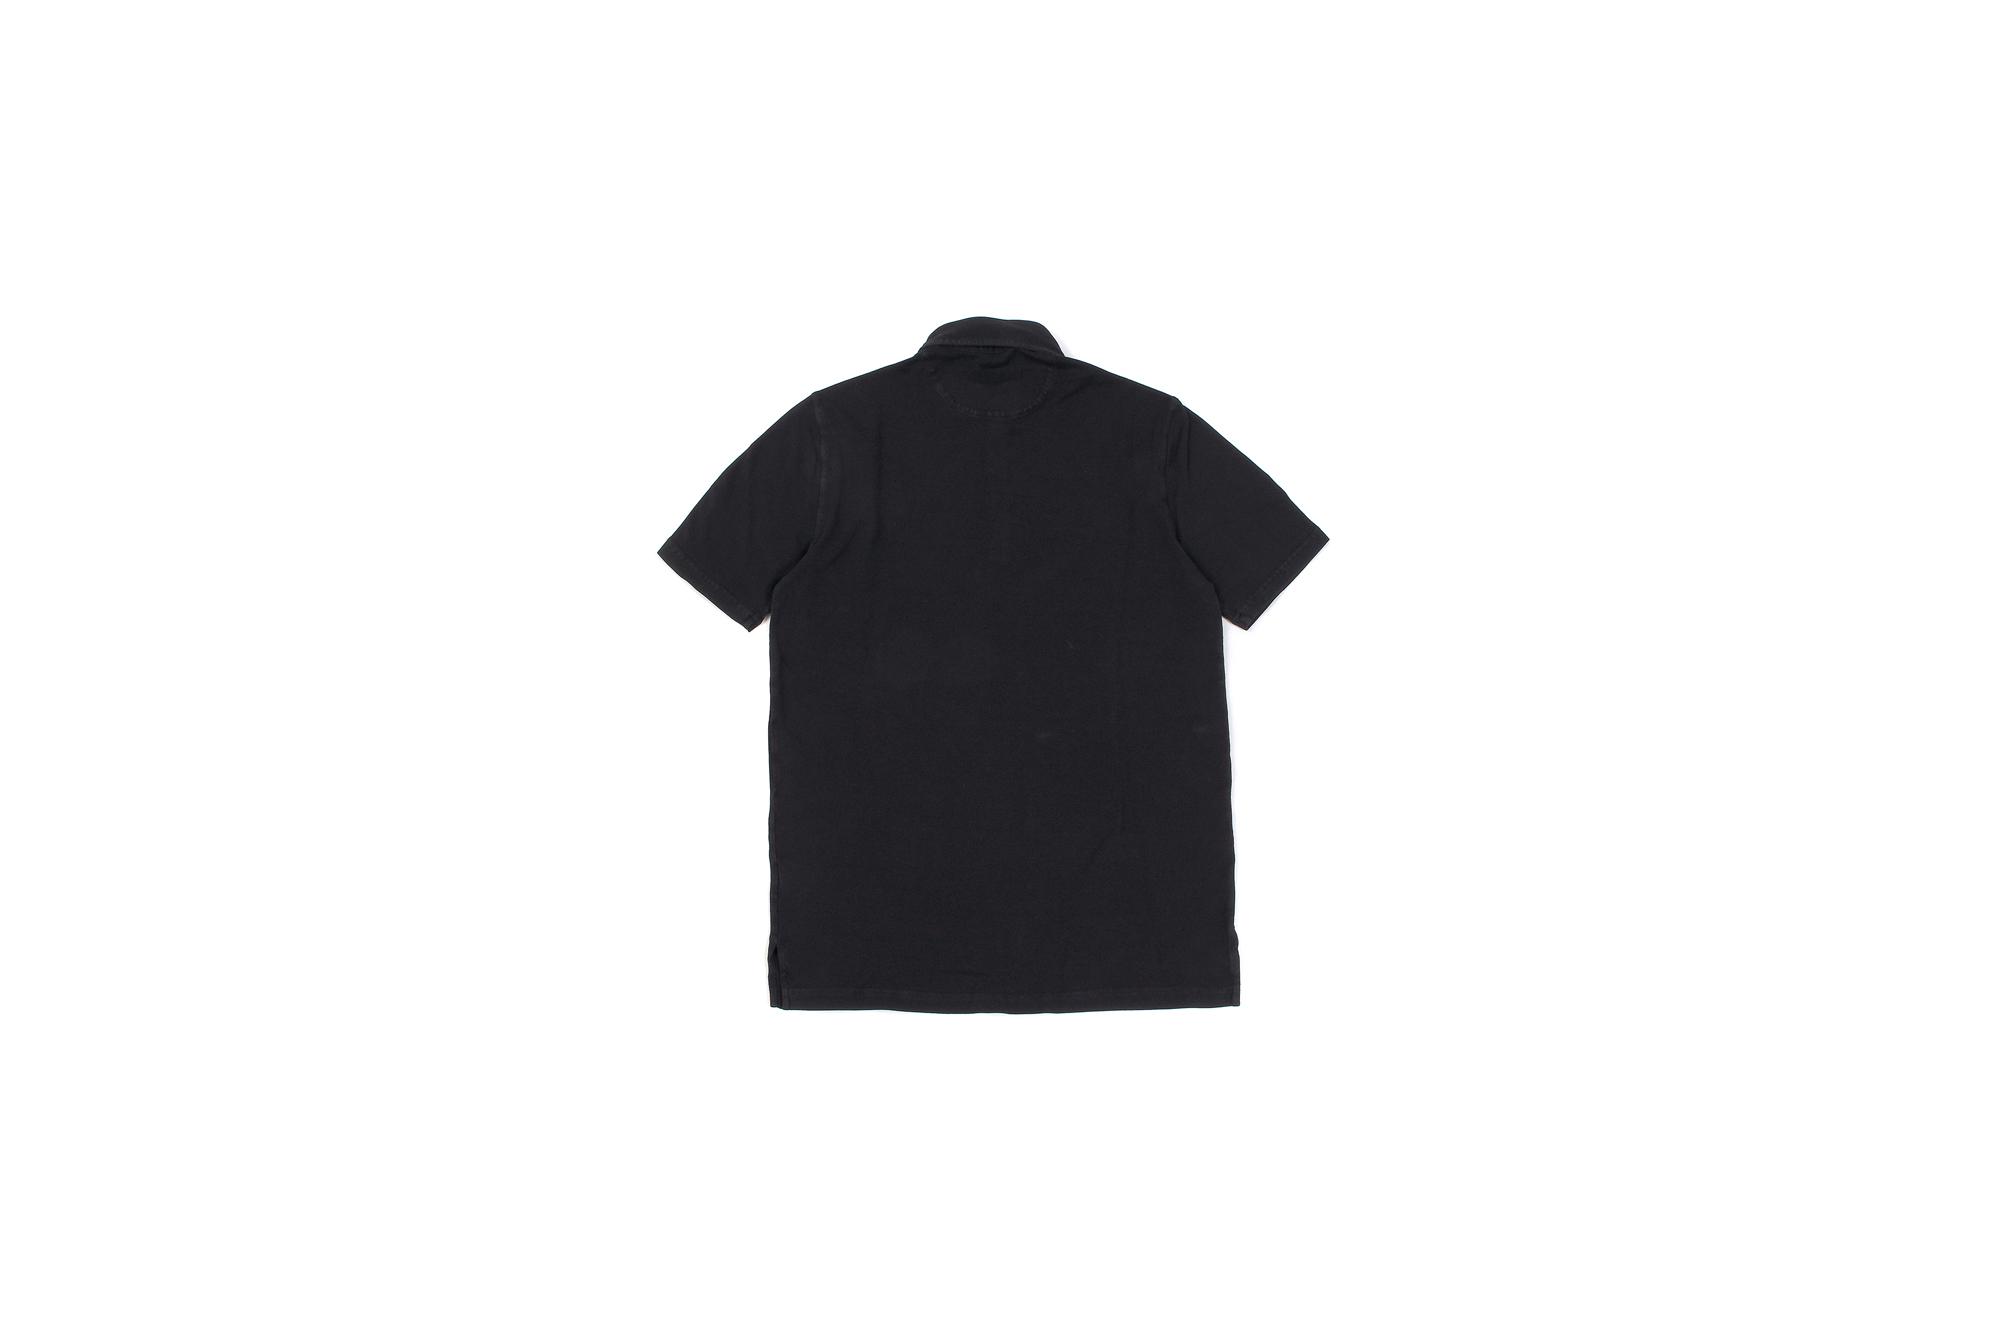 FEDELI(フェデーリ) Piquet Polo Shirt (ピケ ポロシャツ) カノコ ポロシャツ BLACK (ブラック・36) made in italy (イタリア製)2020 春夏 【ご予約開始】愛知 名古屋 altoediritto アルトエデリット ポロ